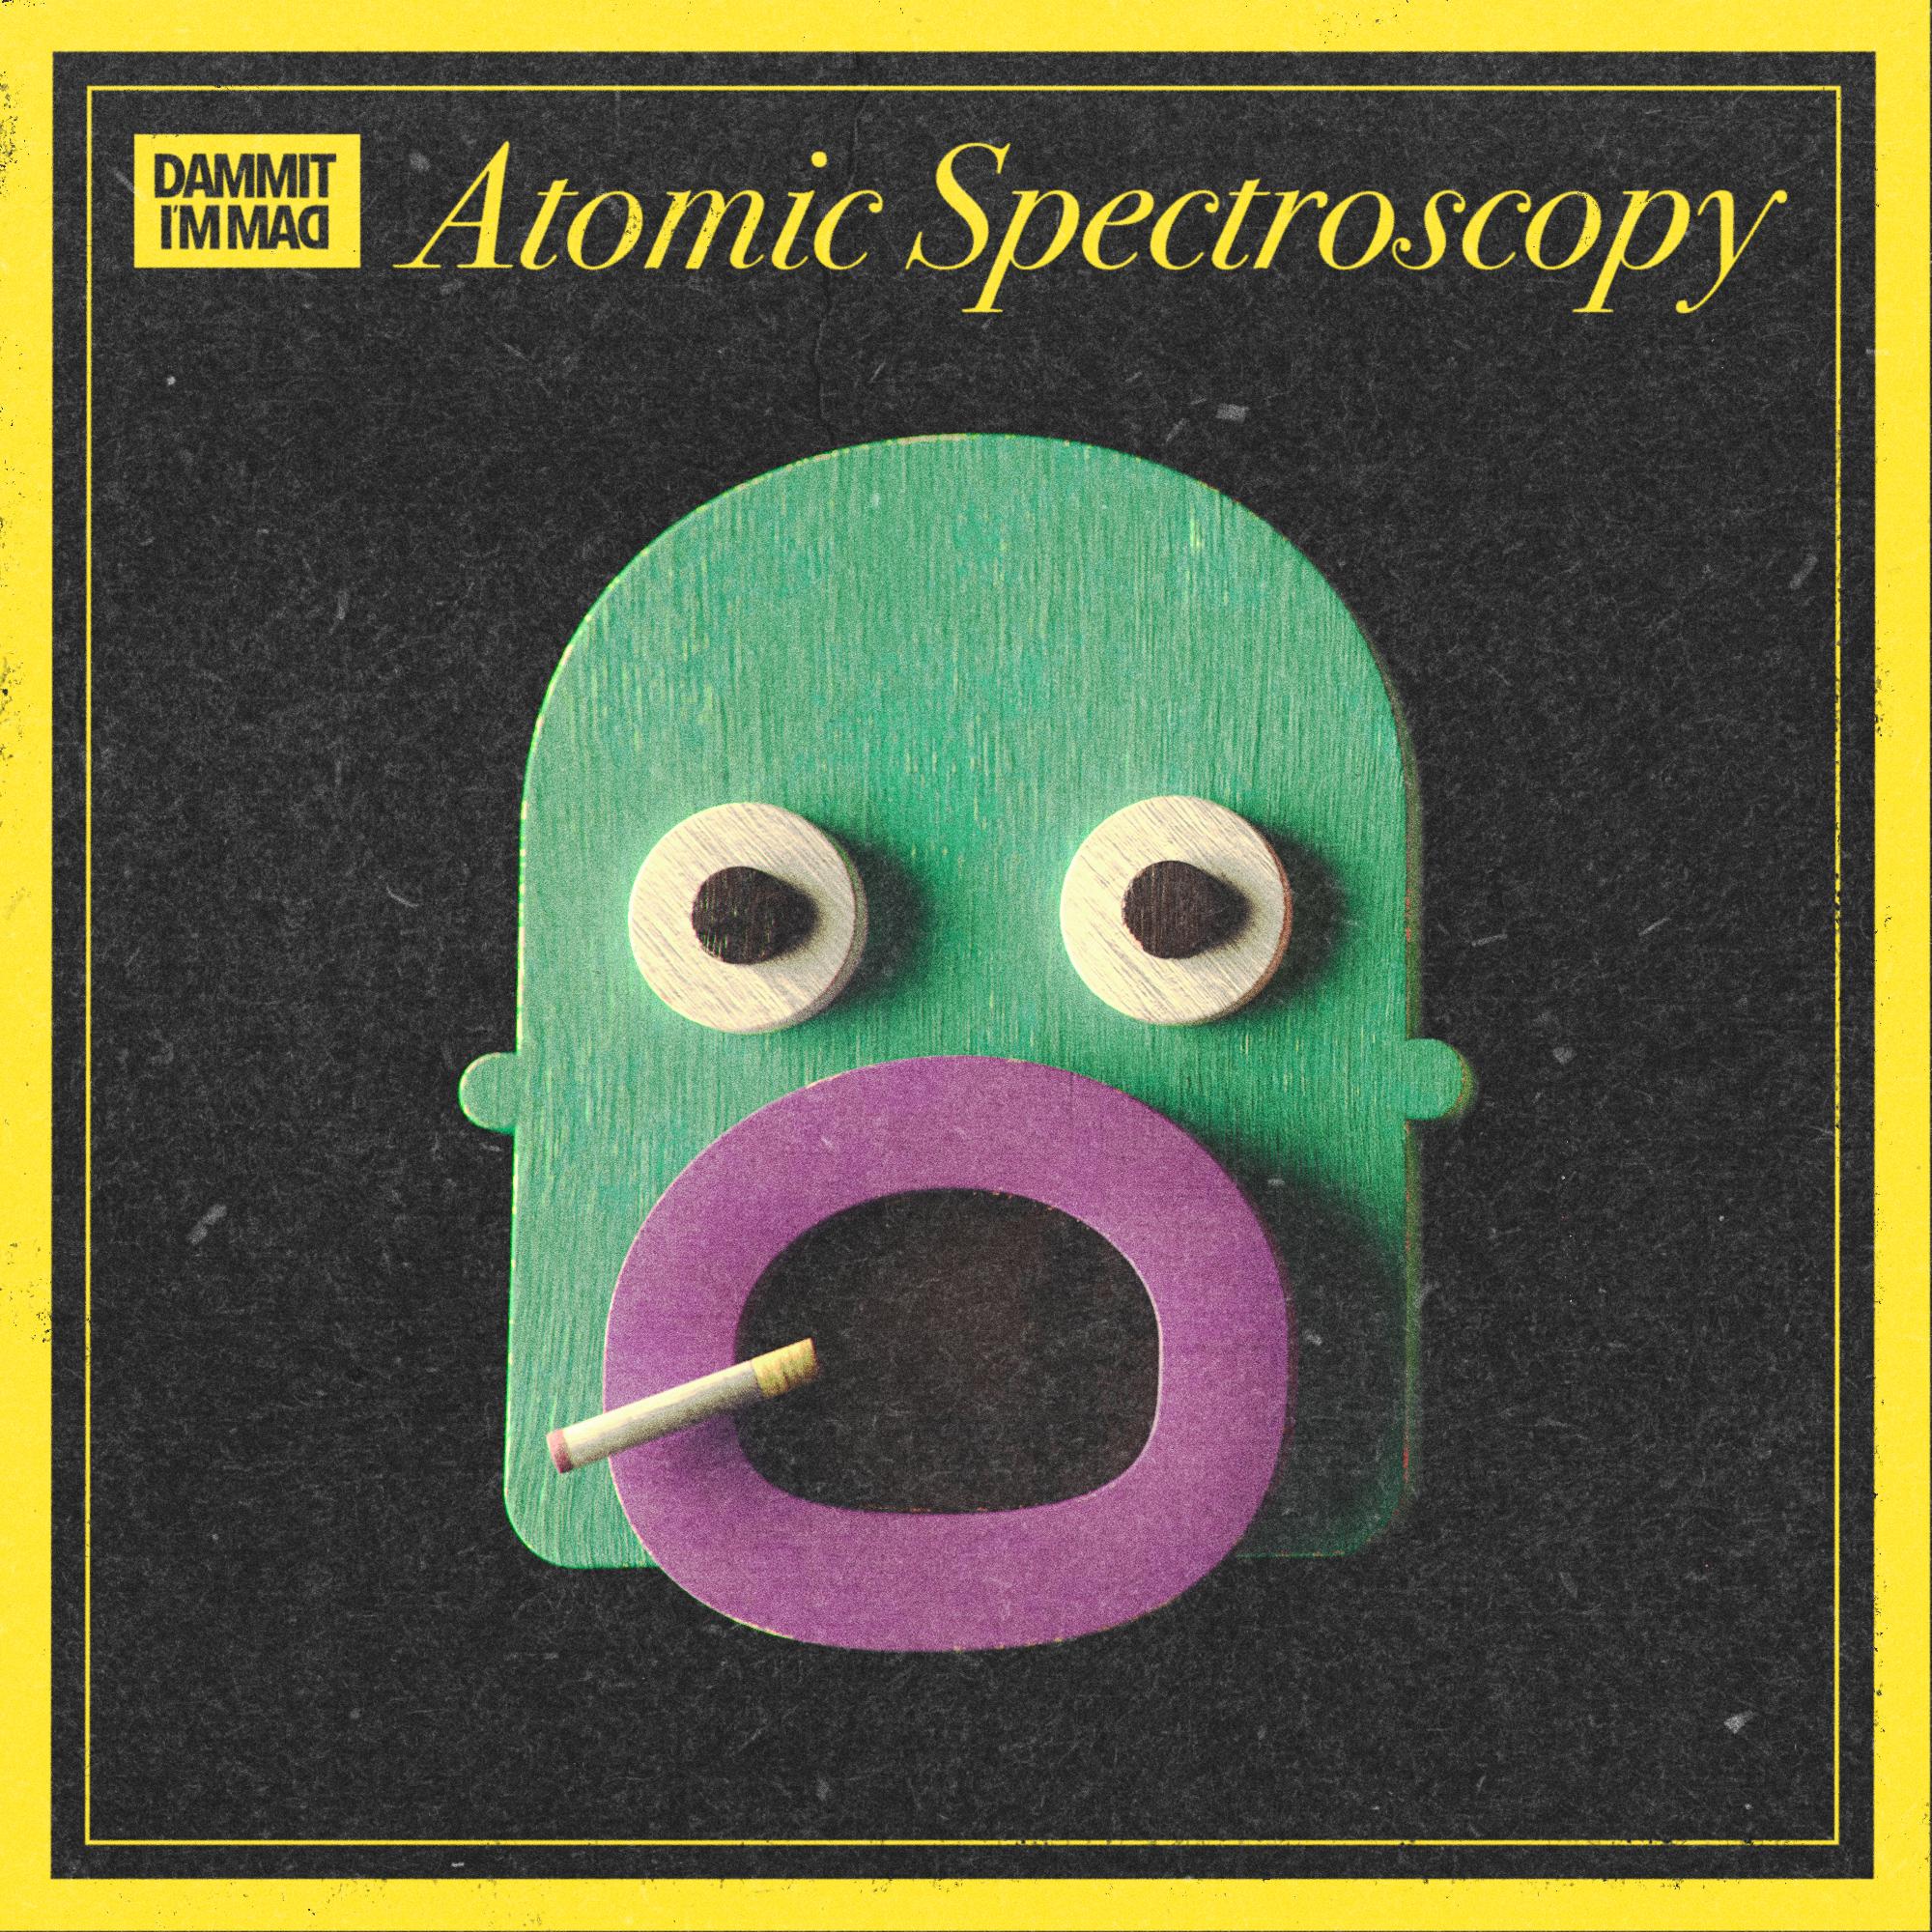 Atomic Spectroscopy - Single 1 Stream: SoundcloudPublic Release: September 14, 2018